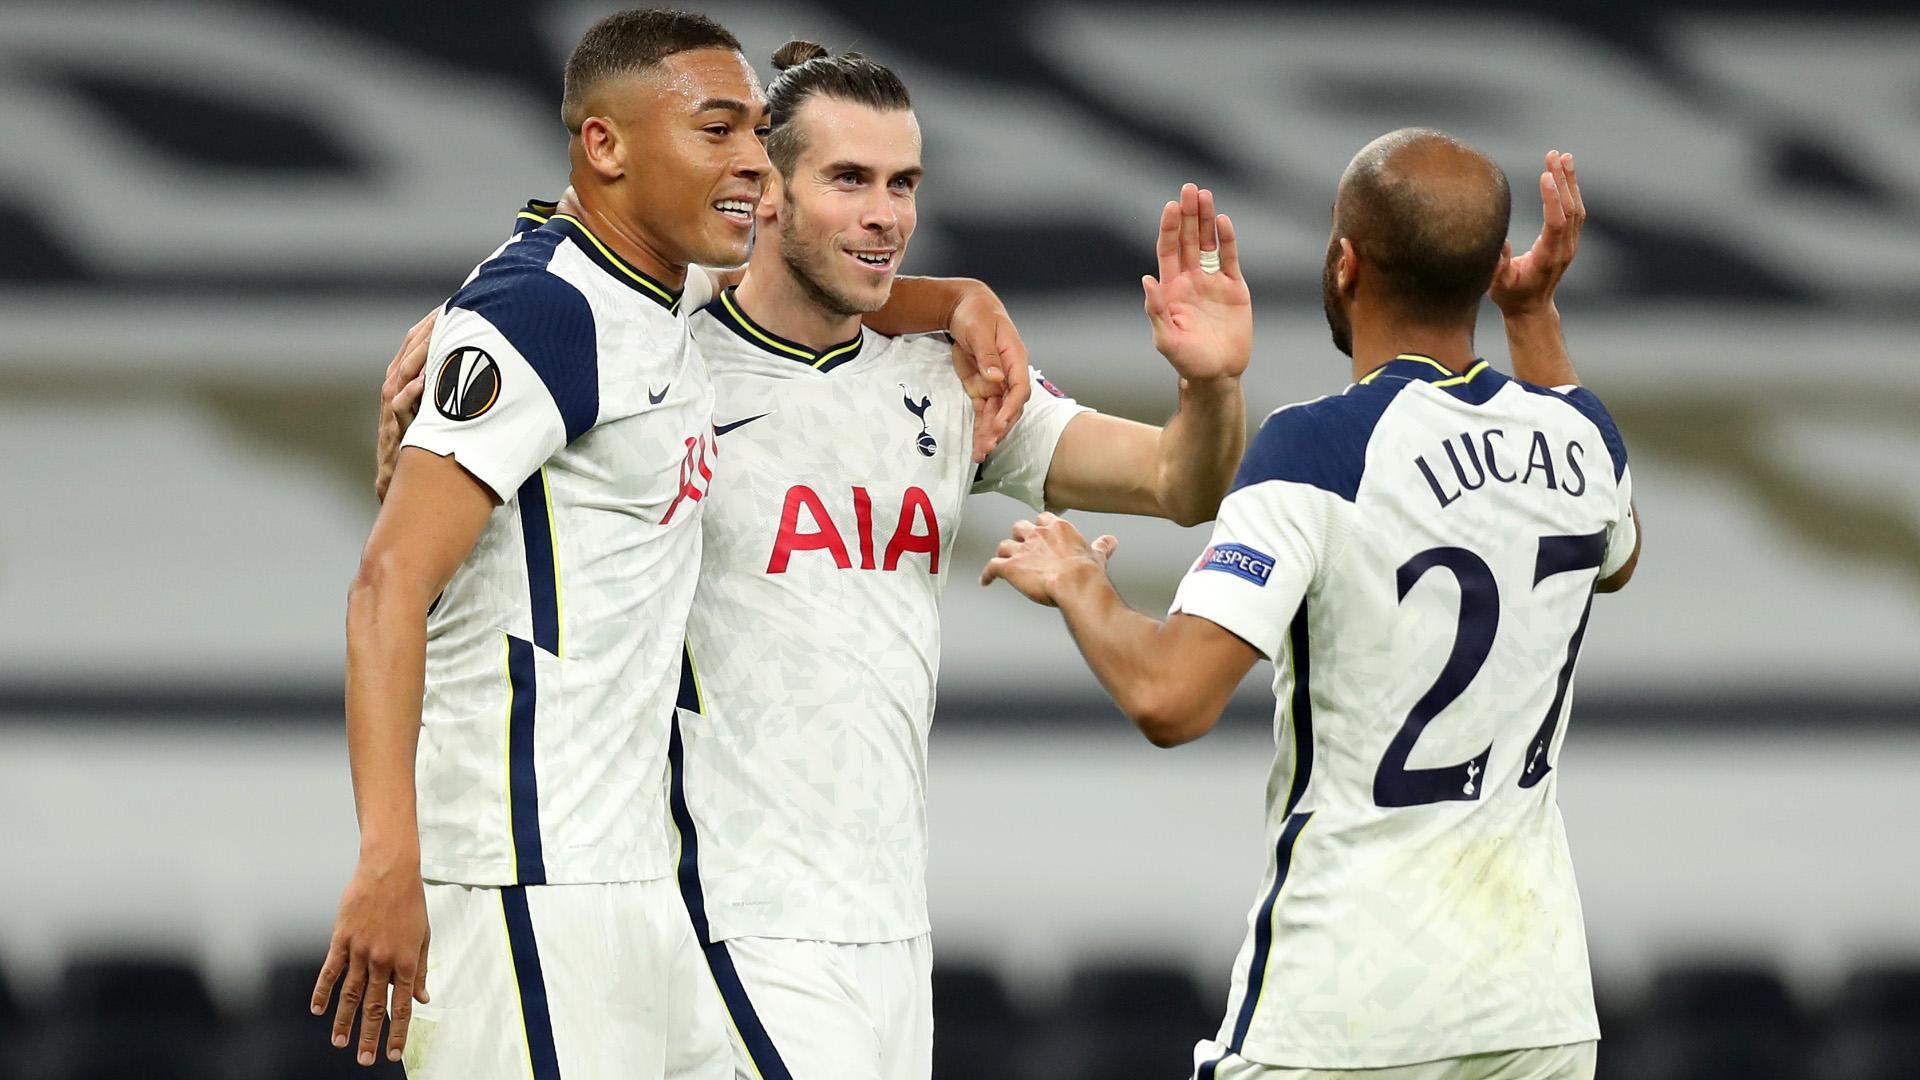 Tottenham Hotspur V Lask Match Report 22 10 2020 Uefa Europa League Goal Com